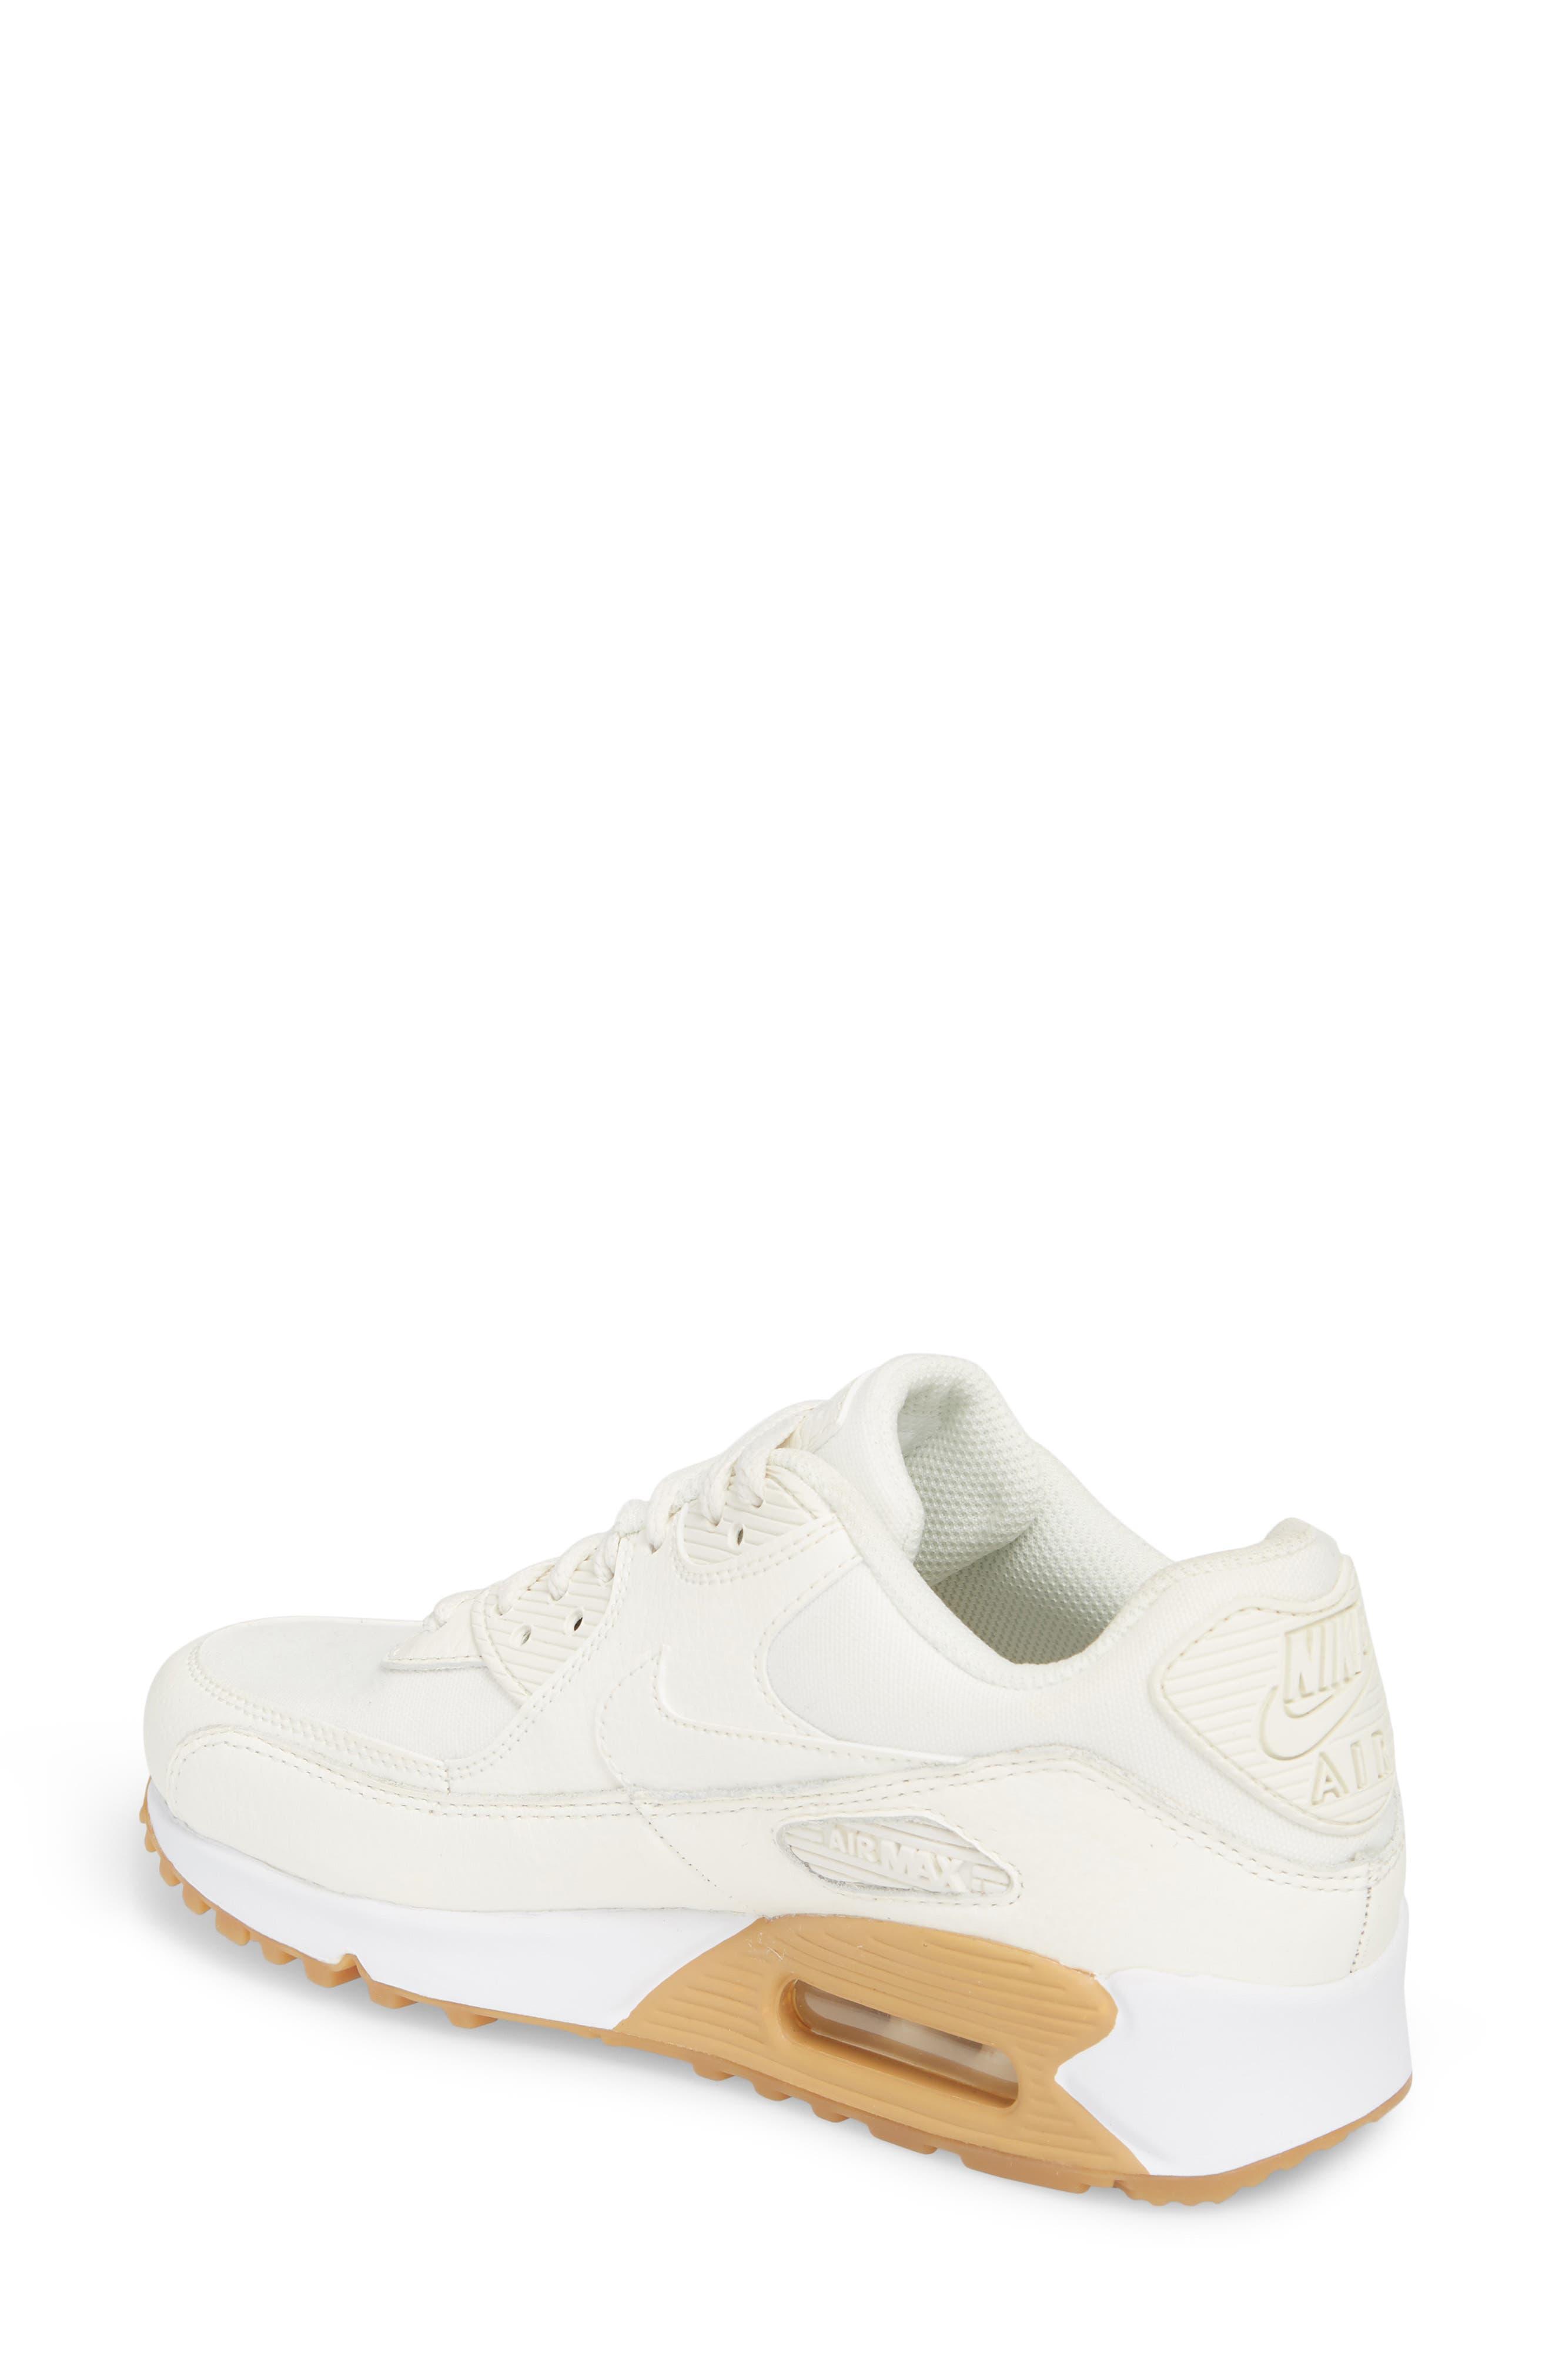 Air Max 90 Premium Sneaker,                             Alternate thumbnail 2, color,                             Sail/ Light Brown/ White